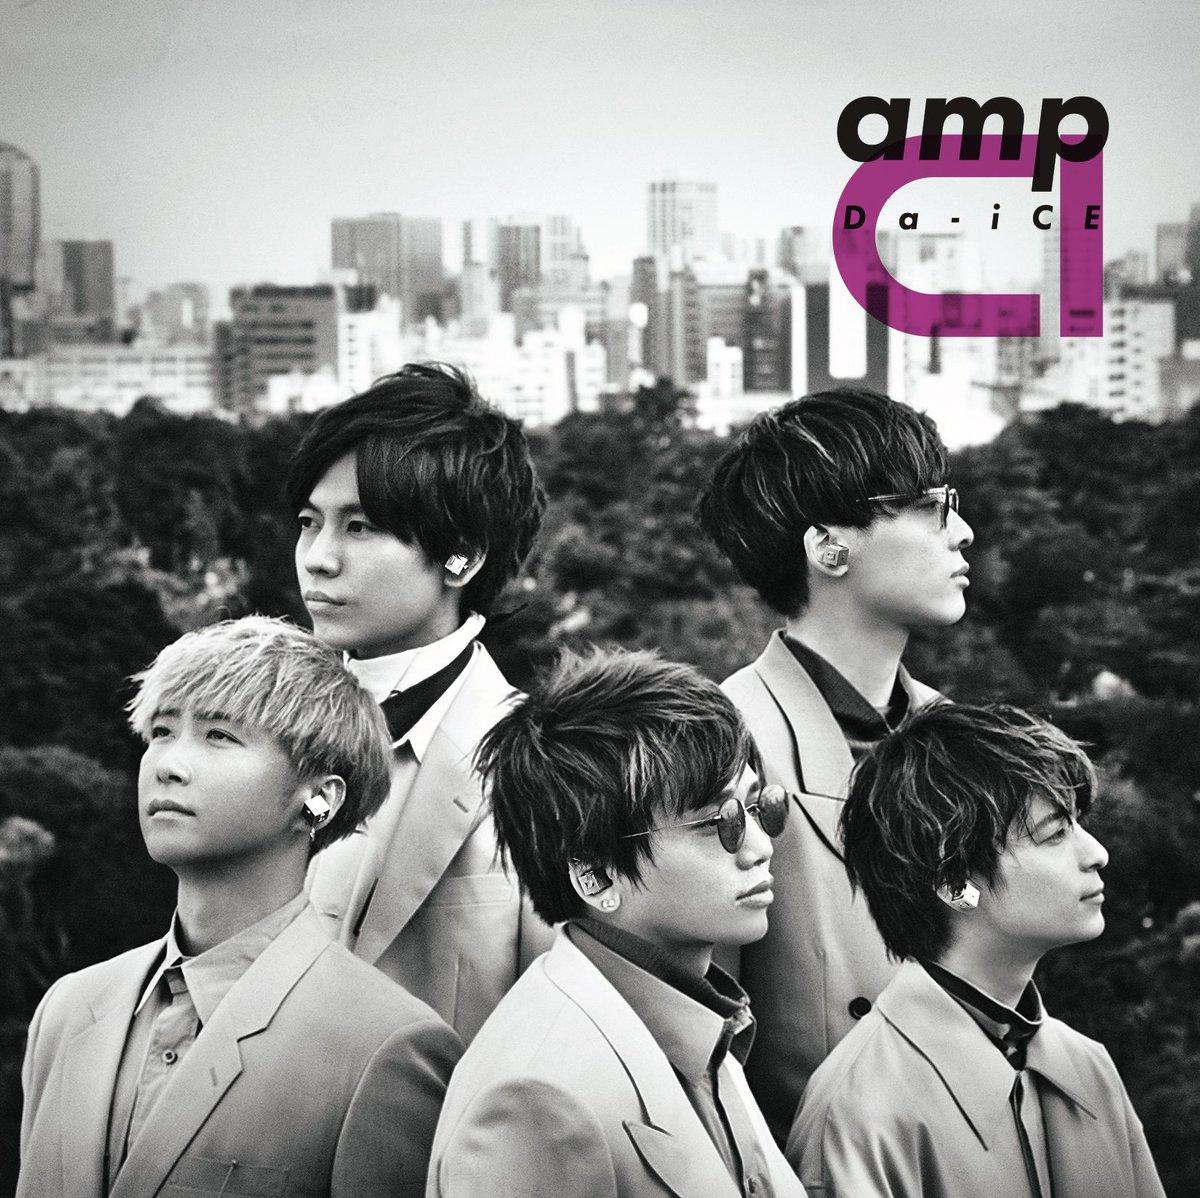 『Da-iCE - New day 2020 歌詞』収録の『amp』ジャケット